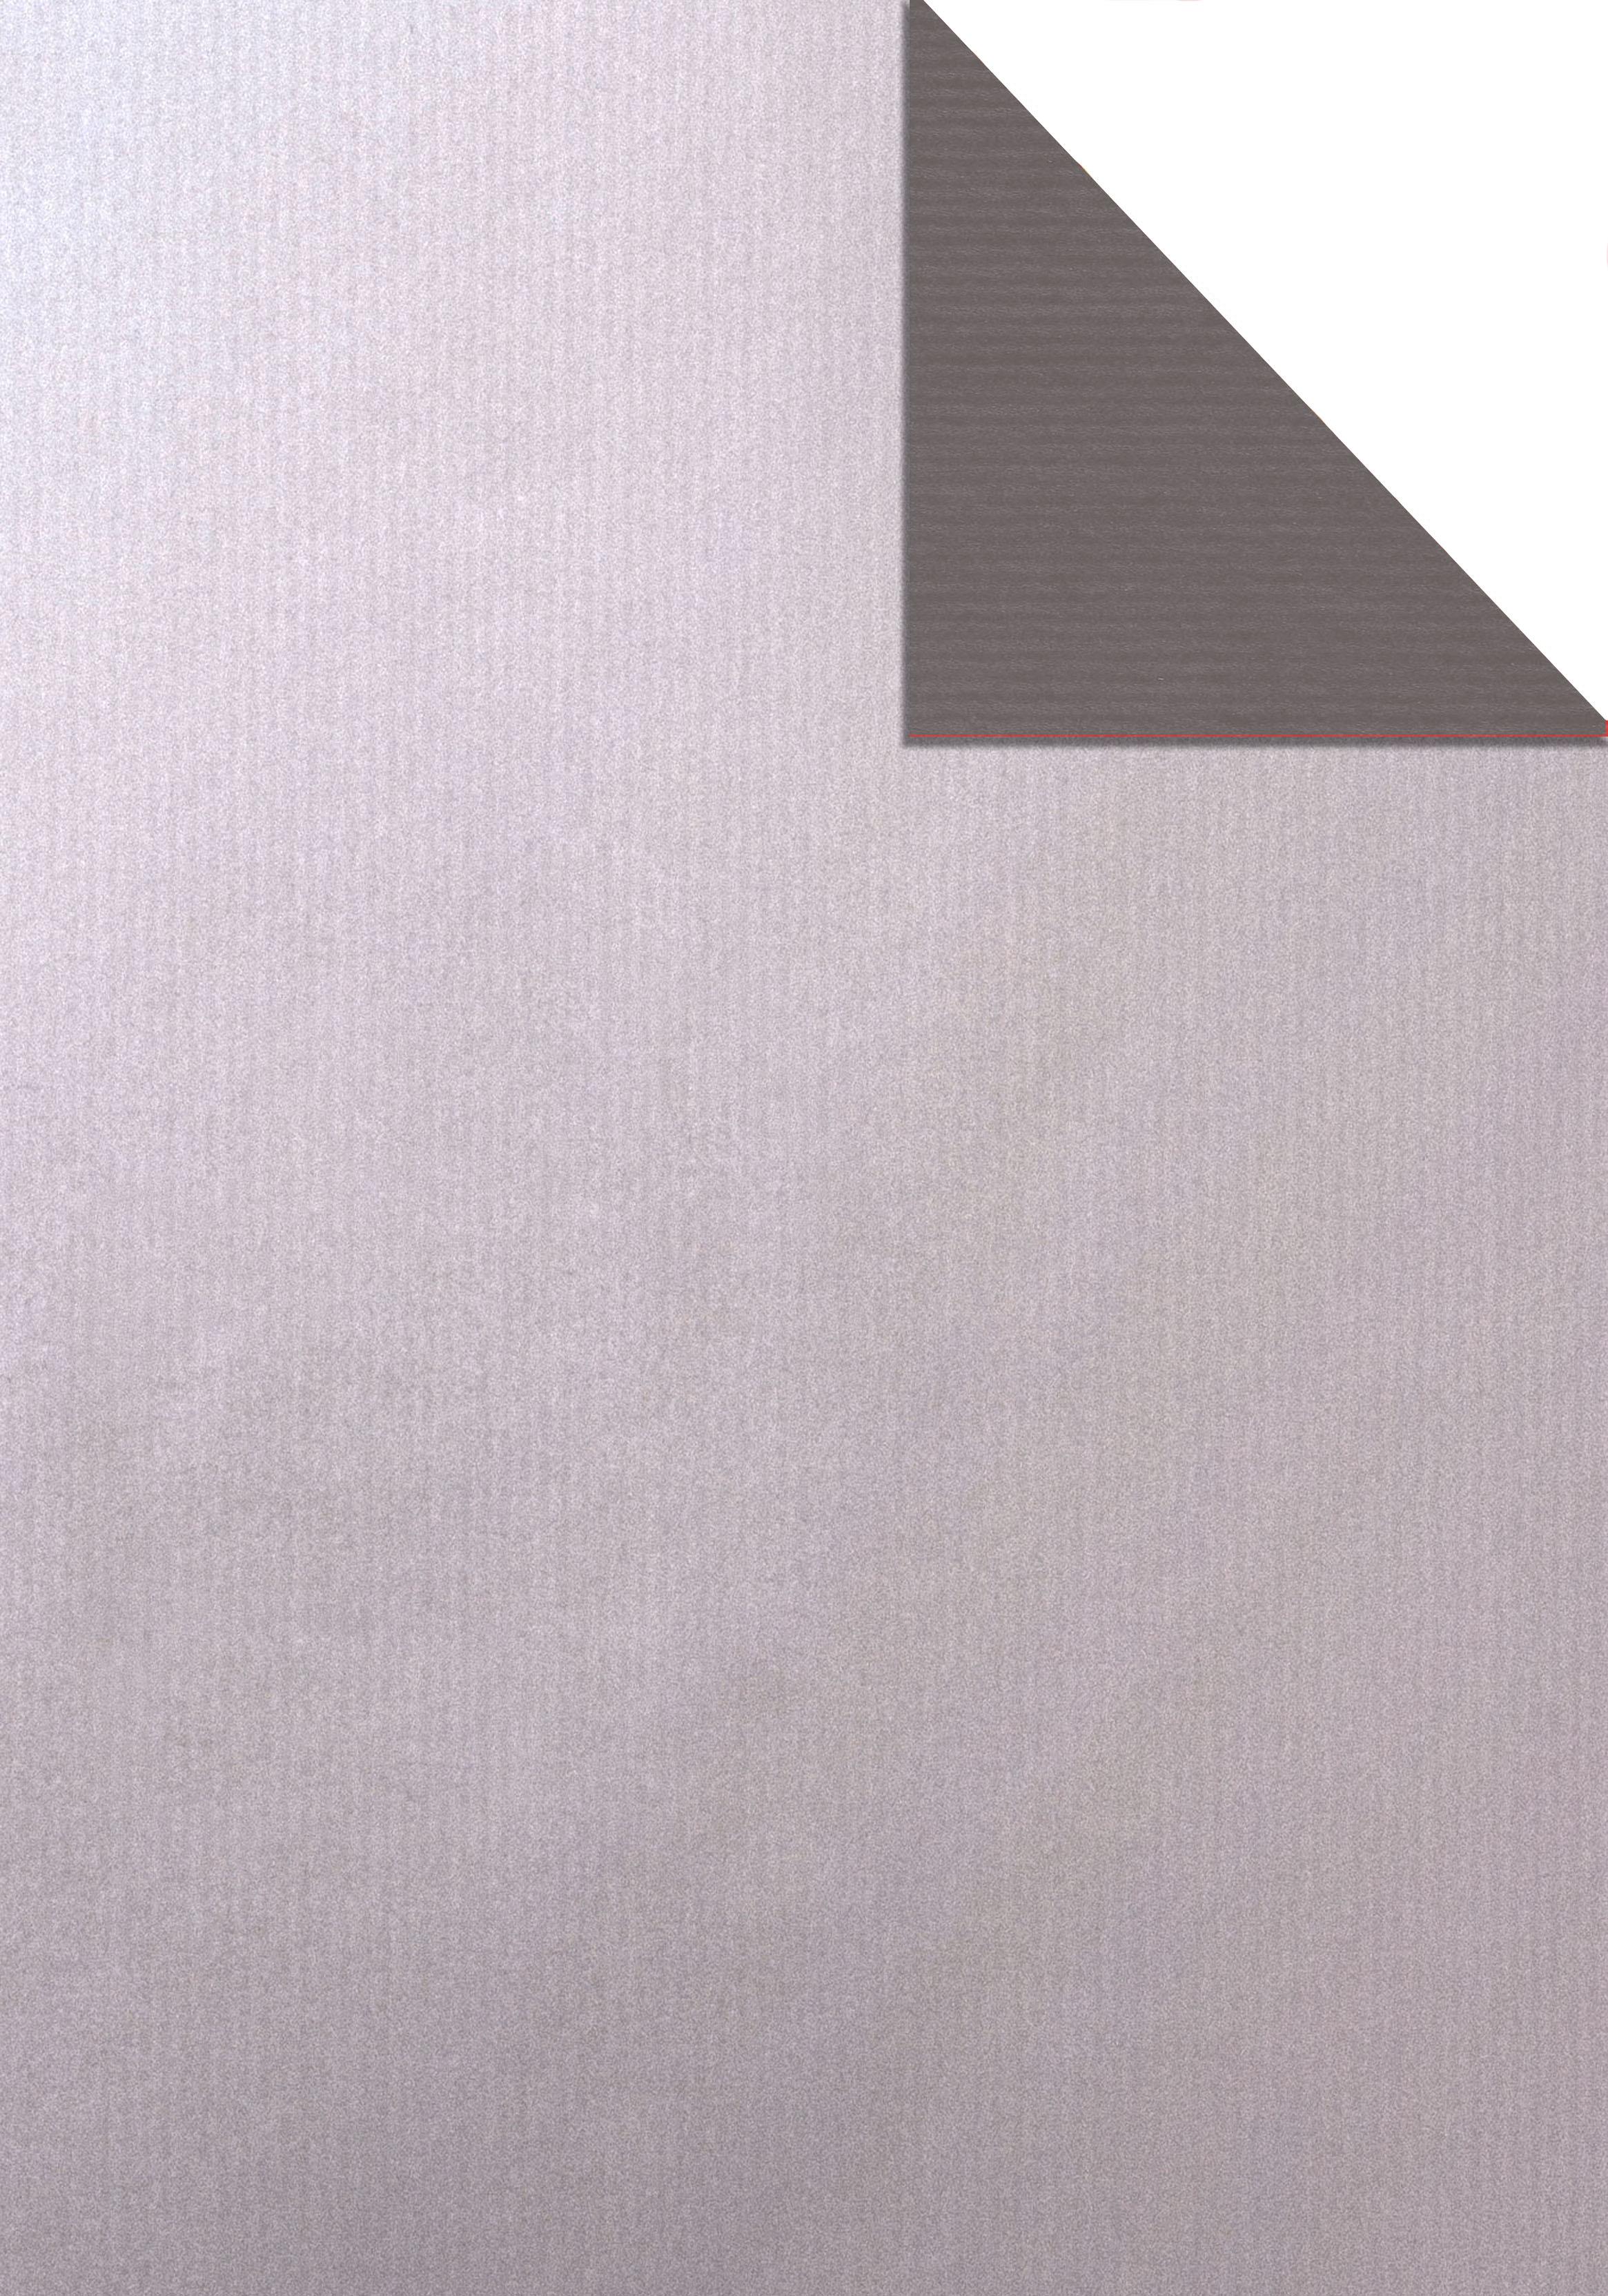 kraft blanc color doble cara plata marengo